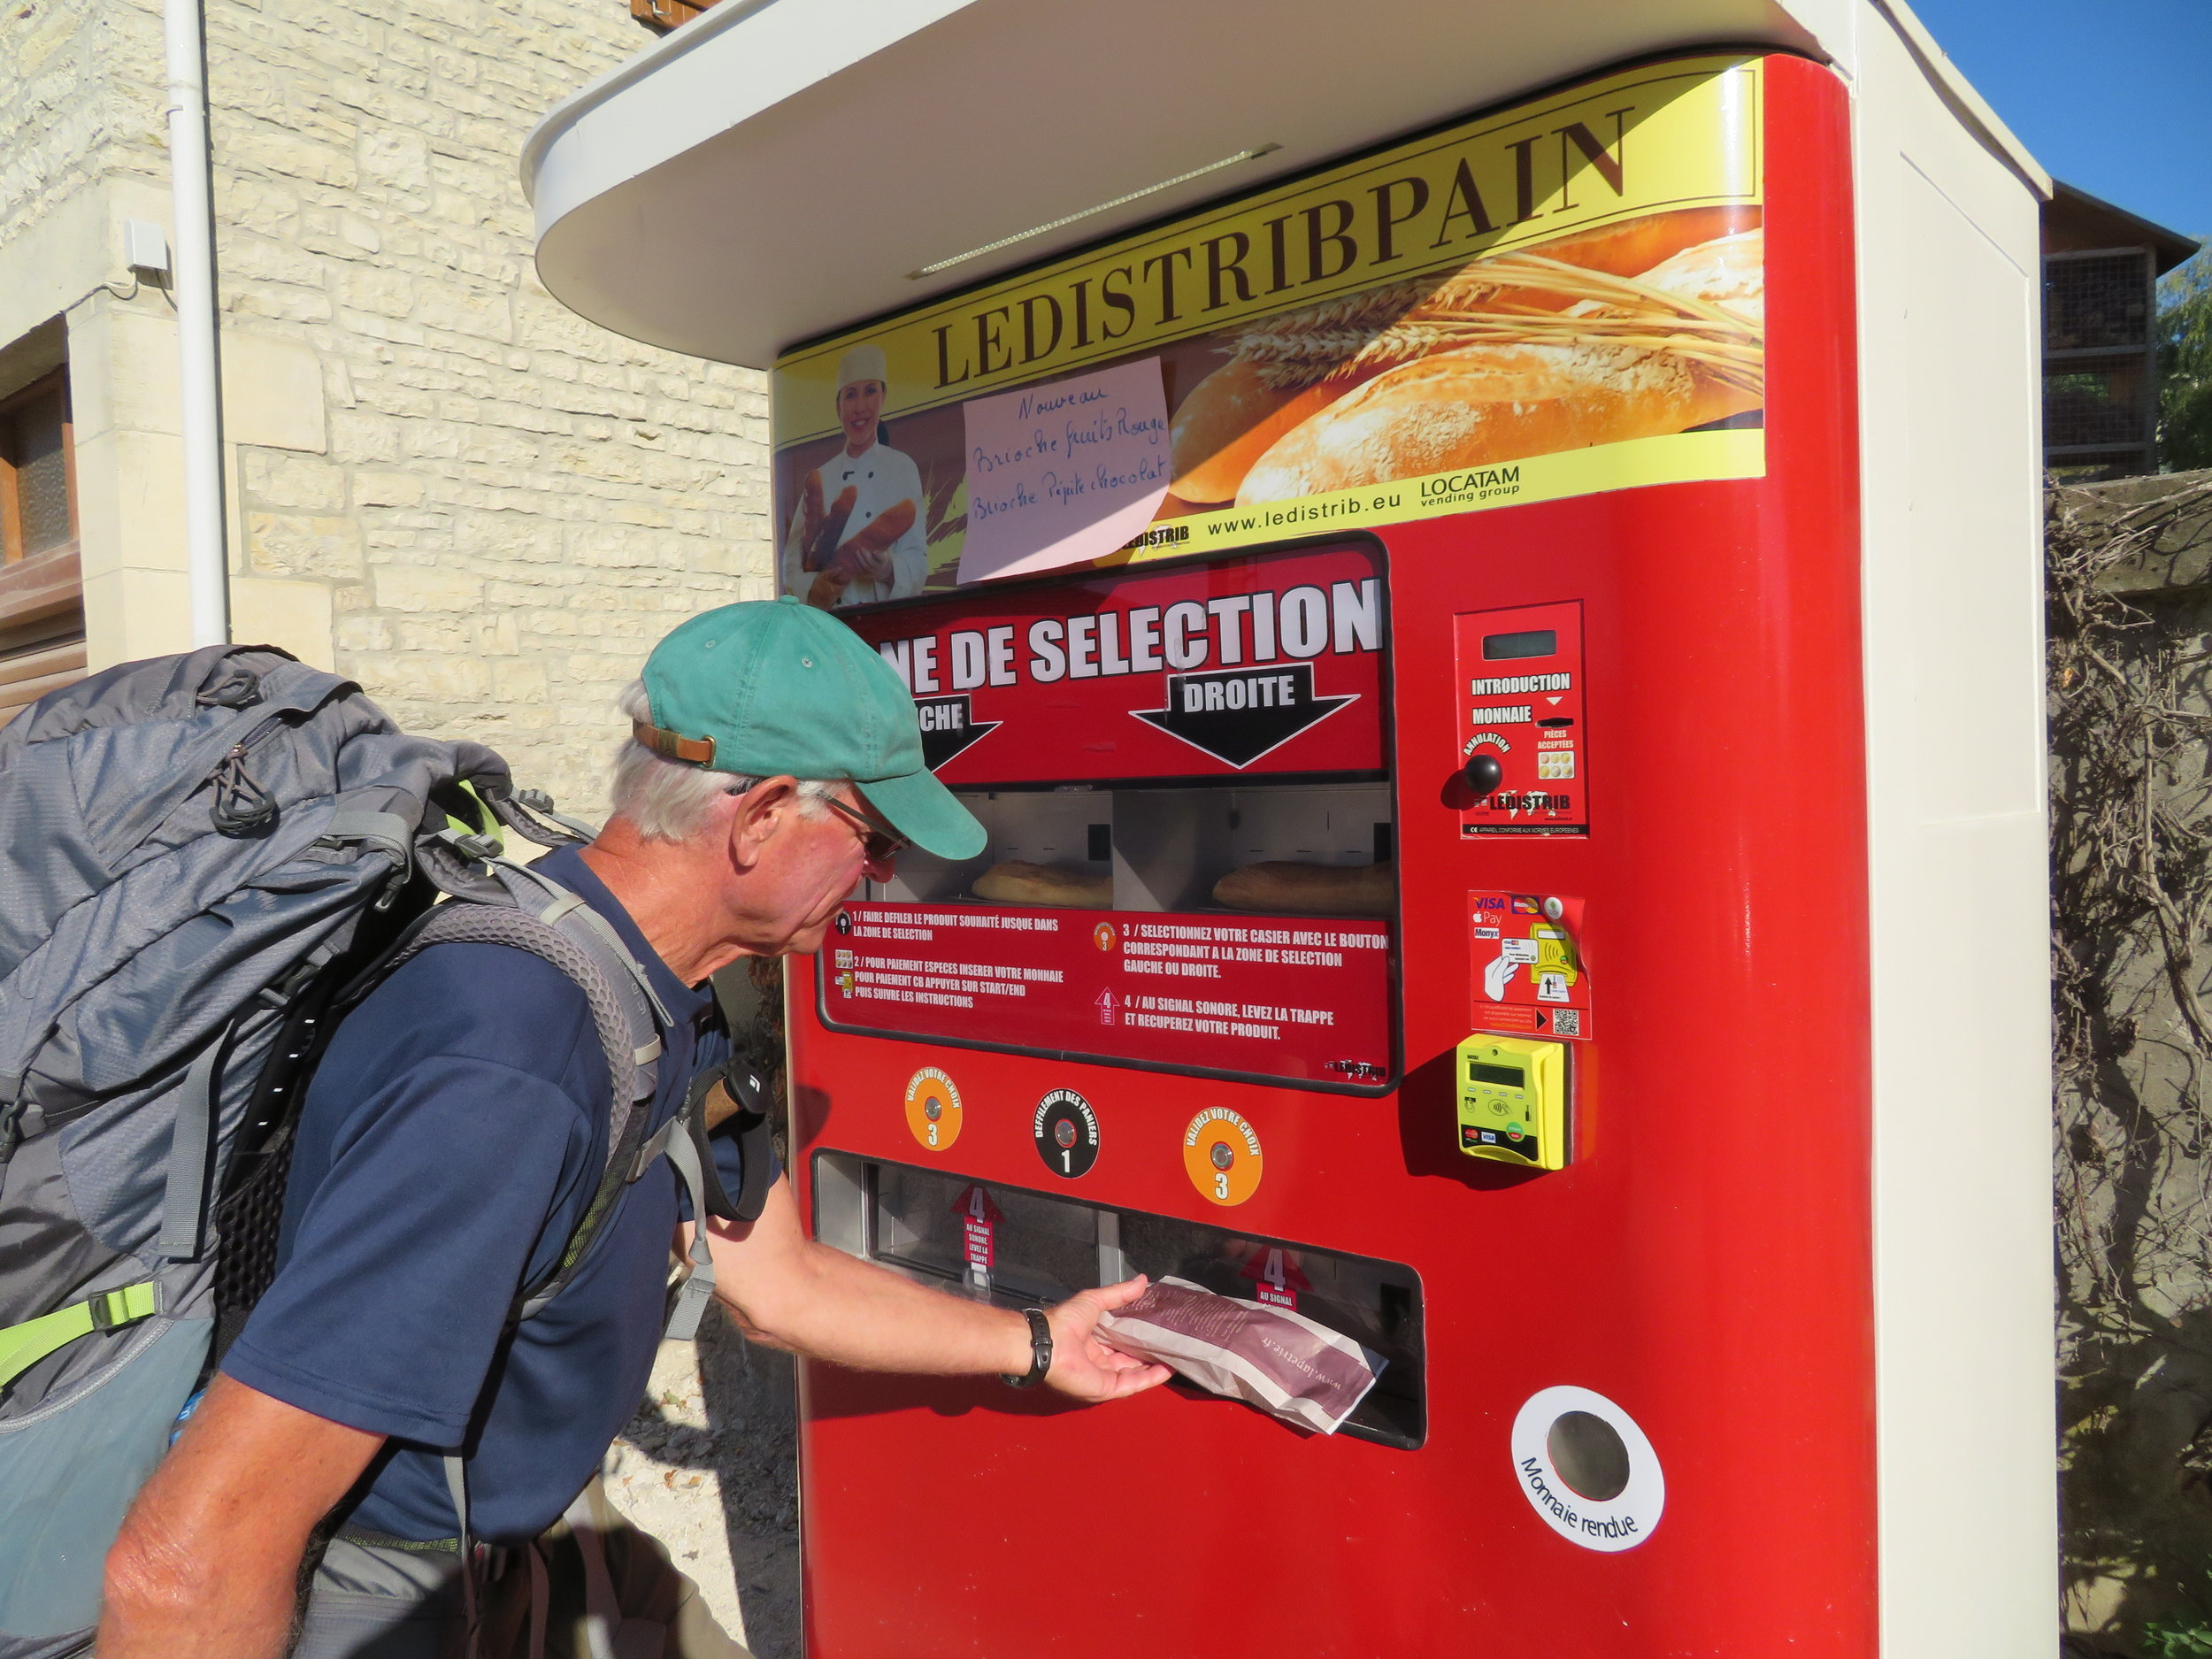 A vending machine for fresh baguettes?